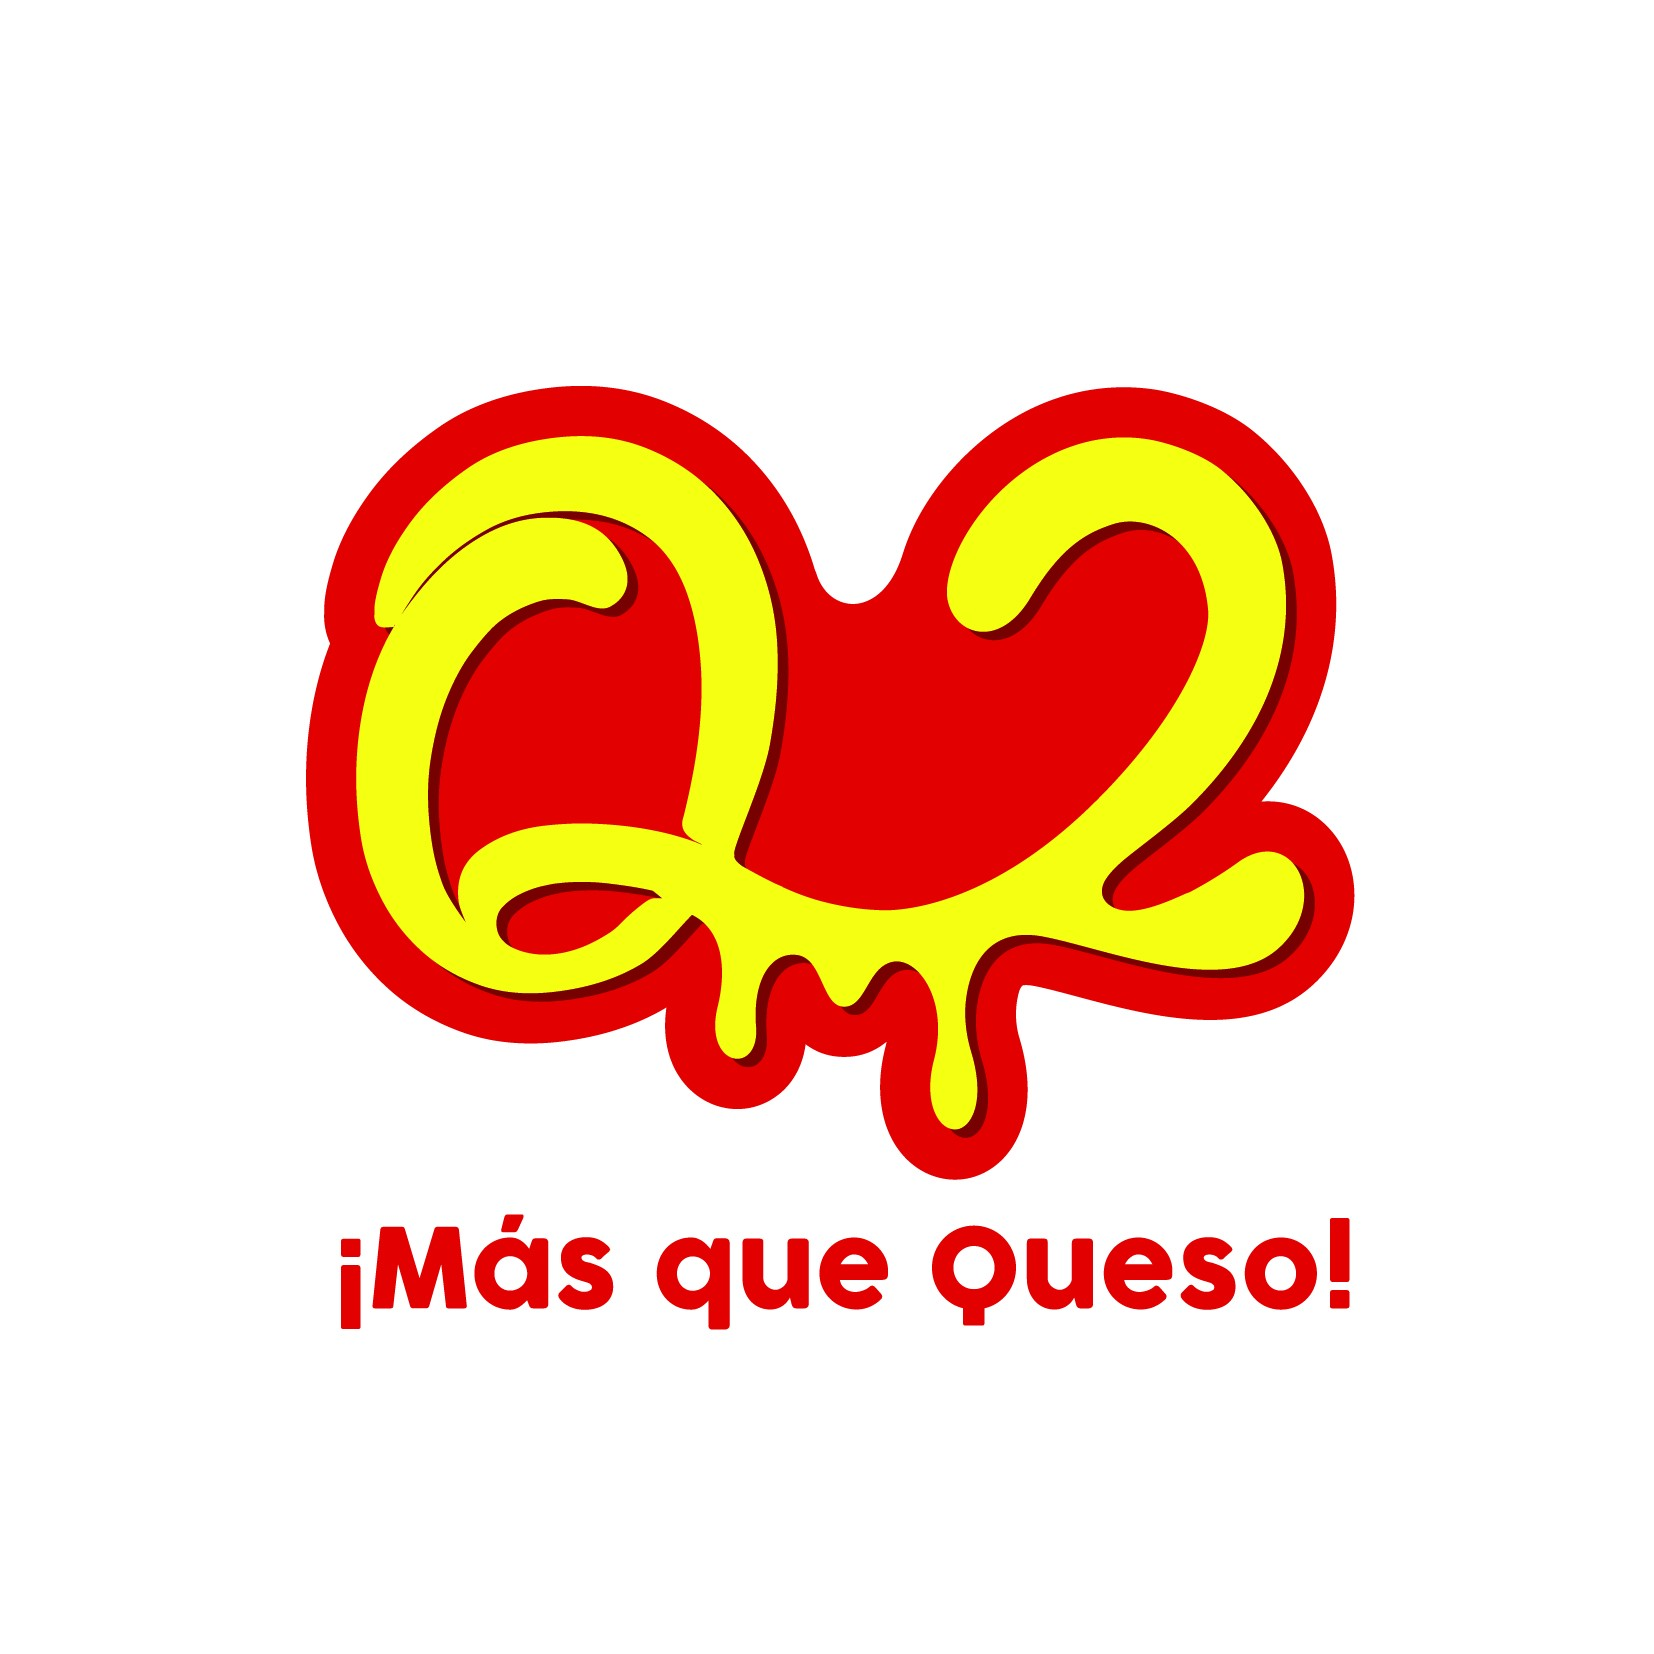 Q2 Mas que Queso